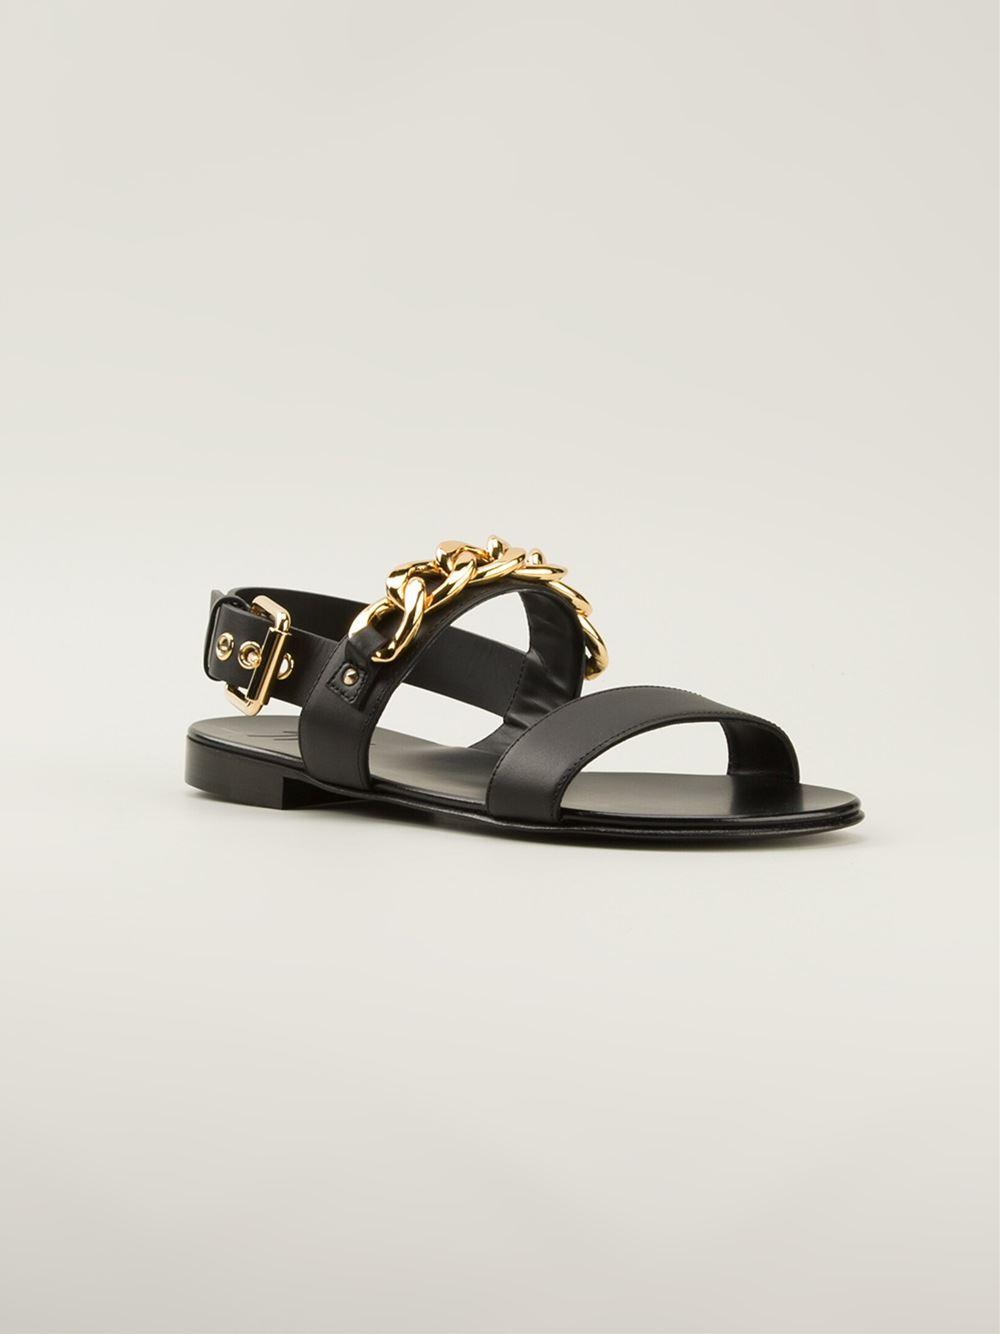 7c0671570010 Lyst - Giuseppe Zanotti Chain Trim Sandals in Black for Men